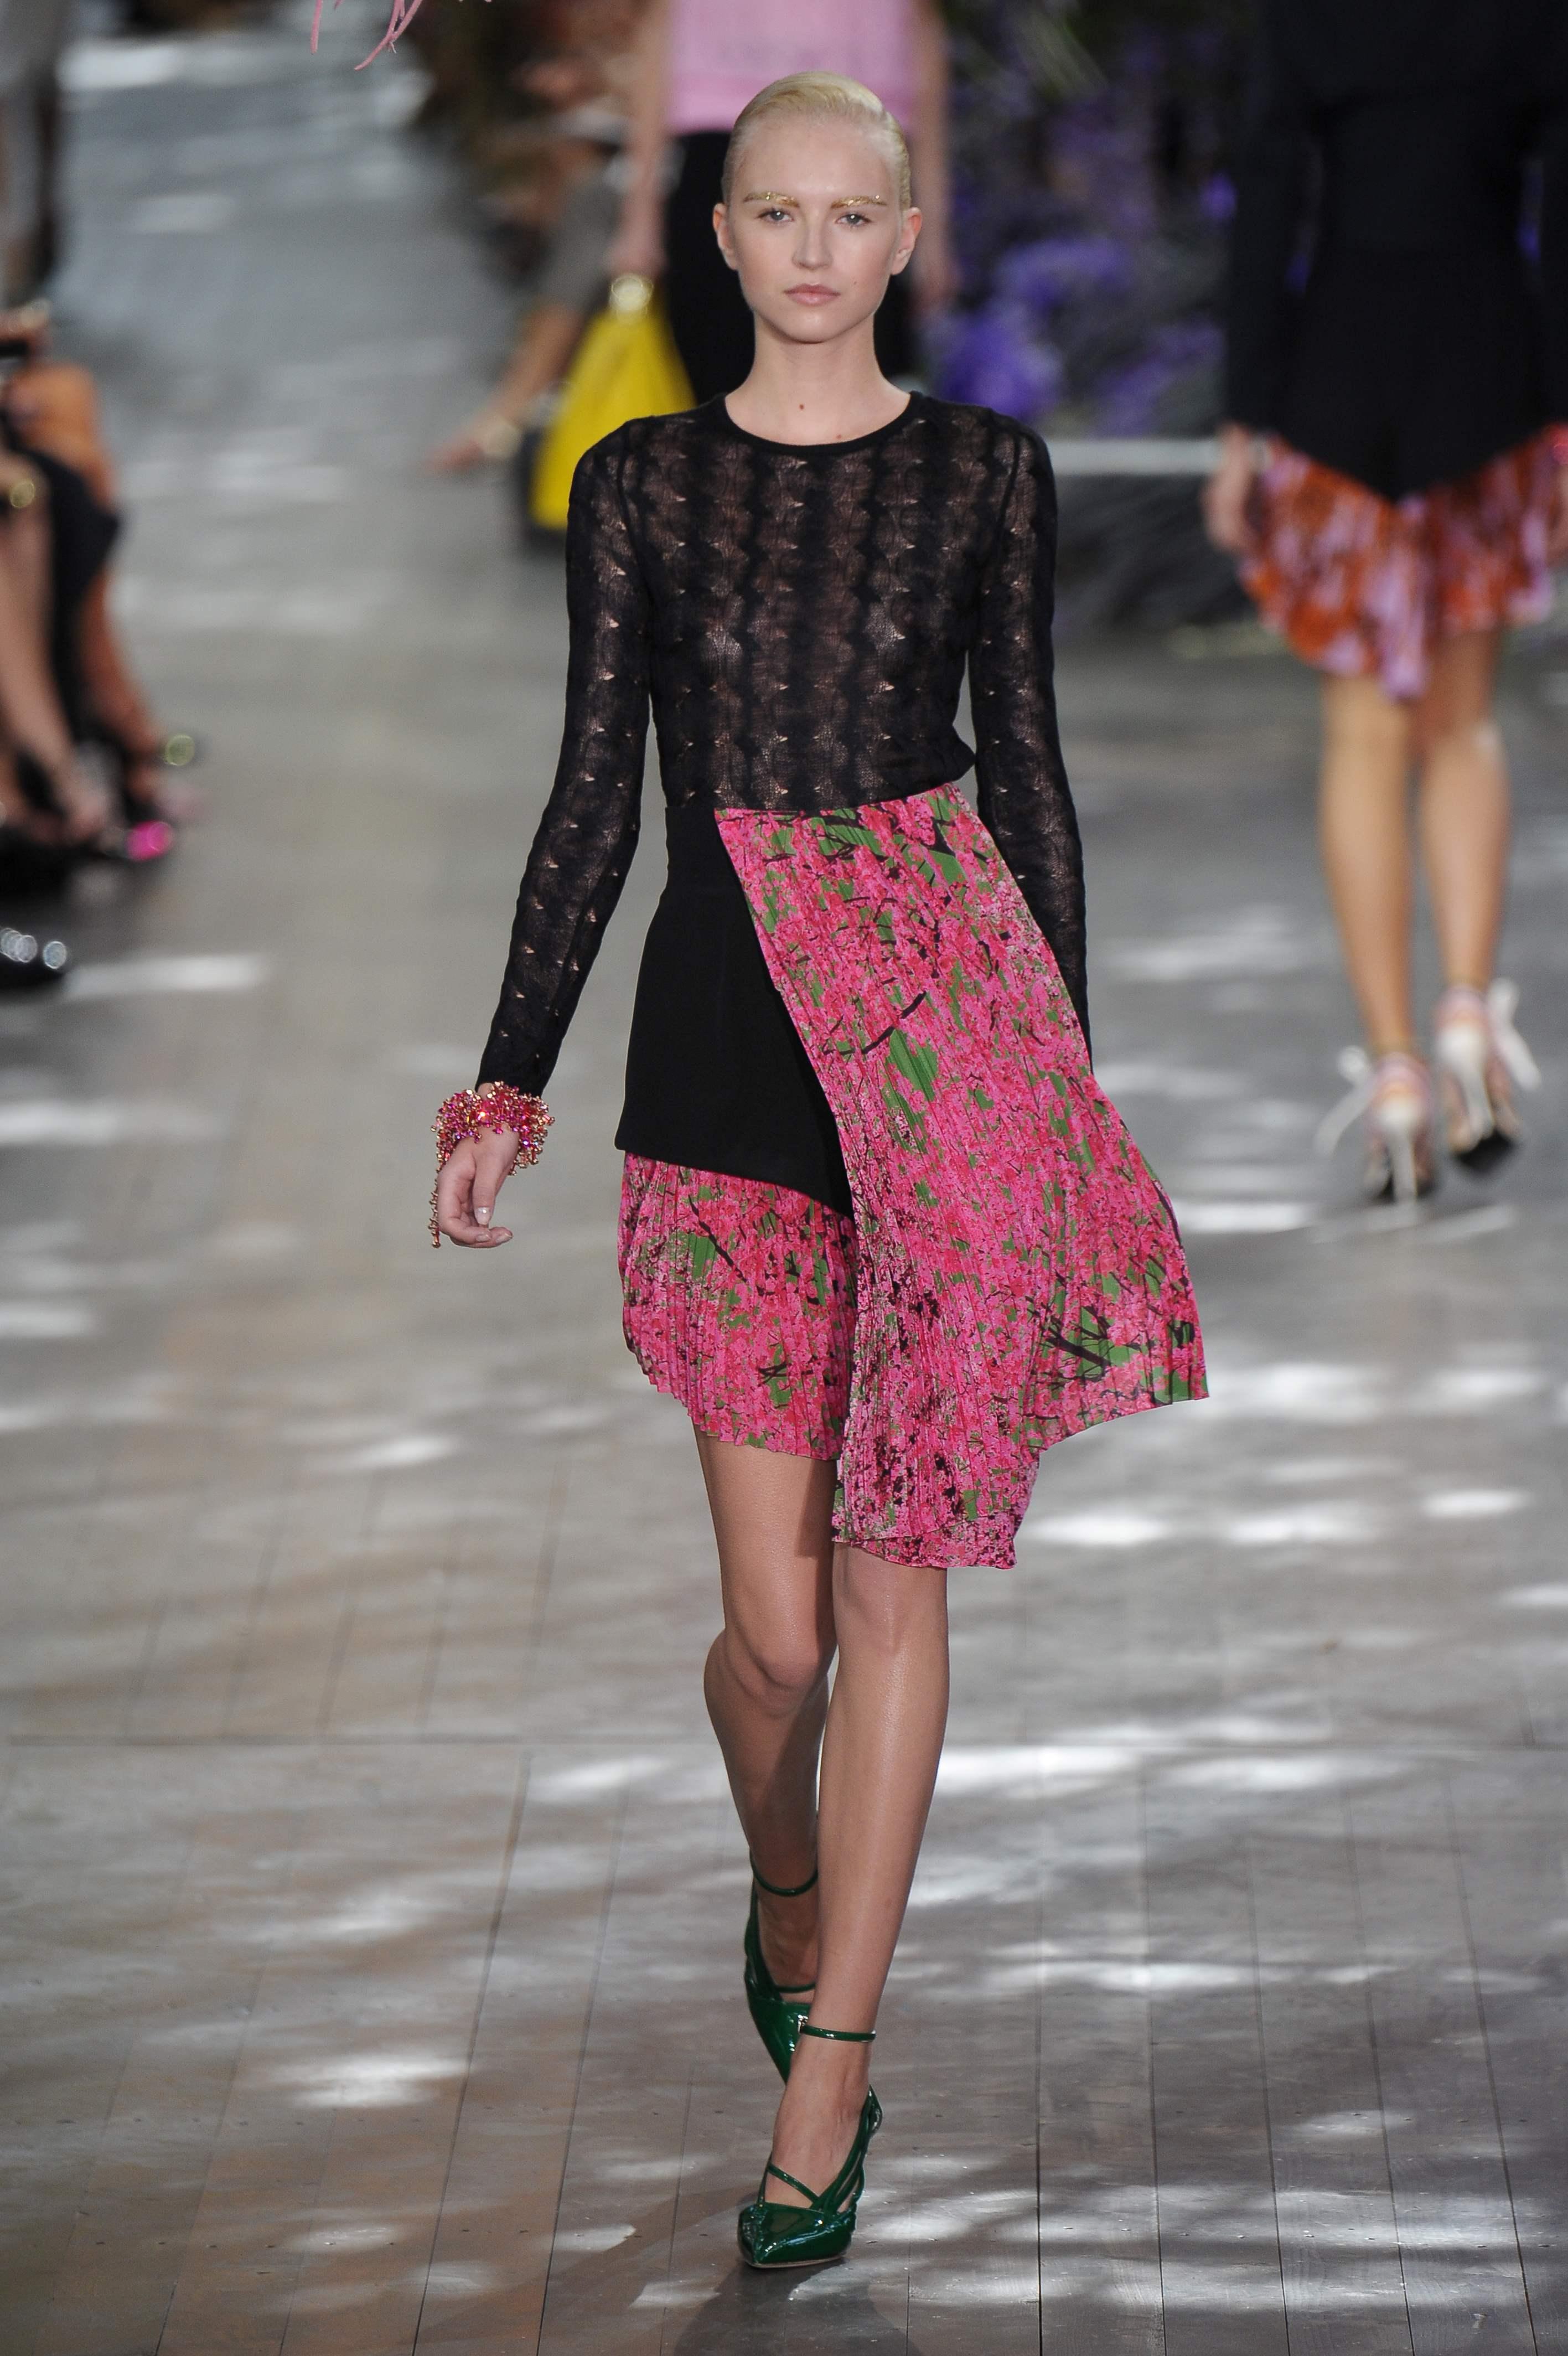 DIOR_Ready to wear sprng_summer 2014;  Paris_fashion week  september_2013